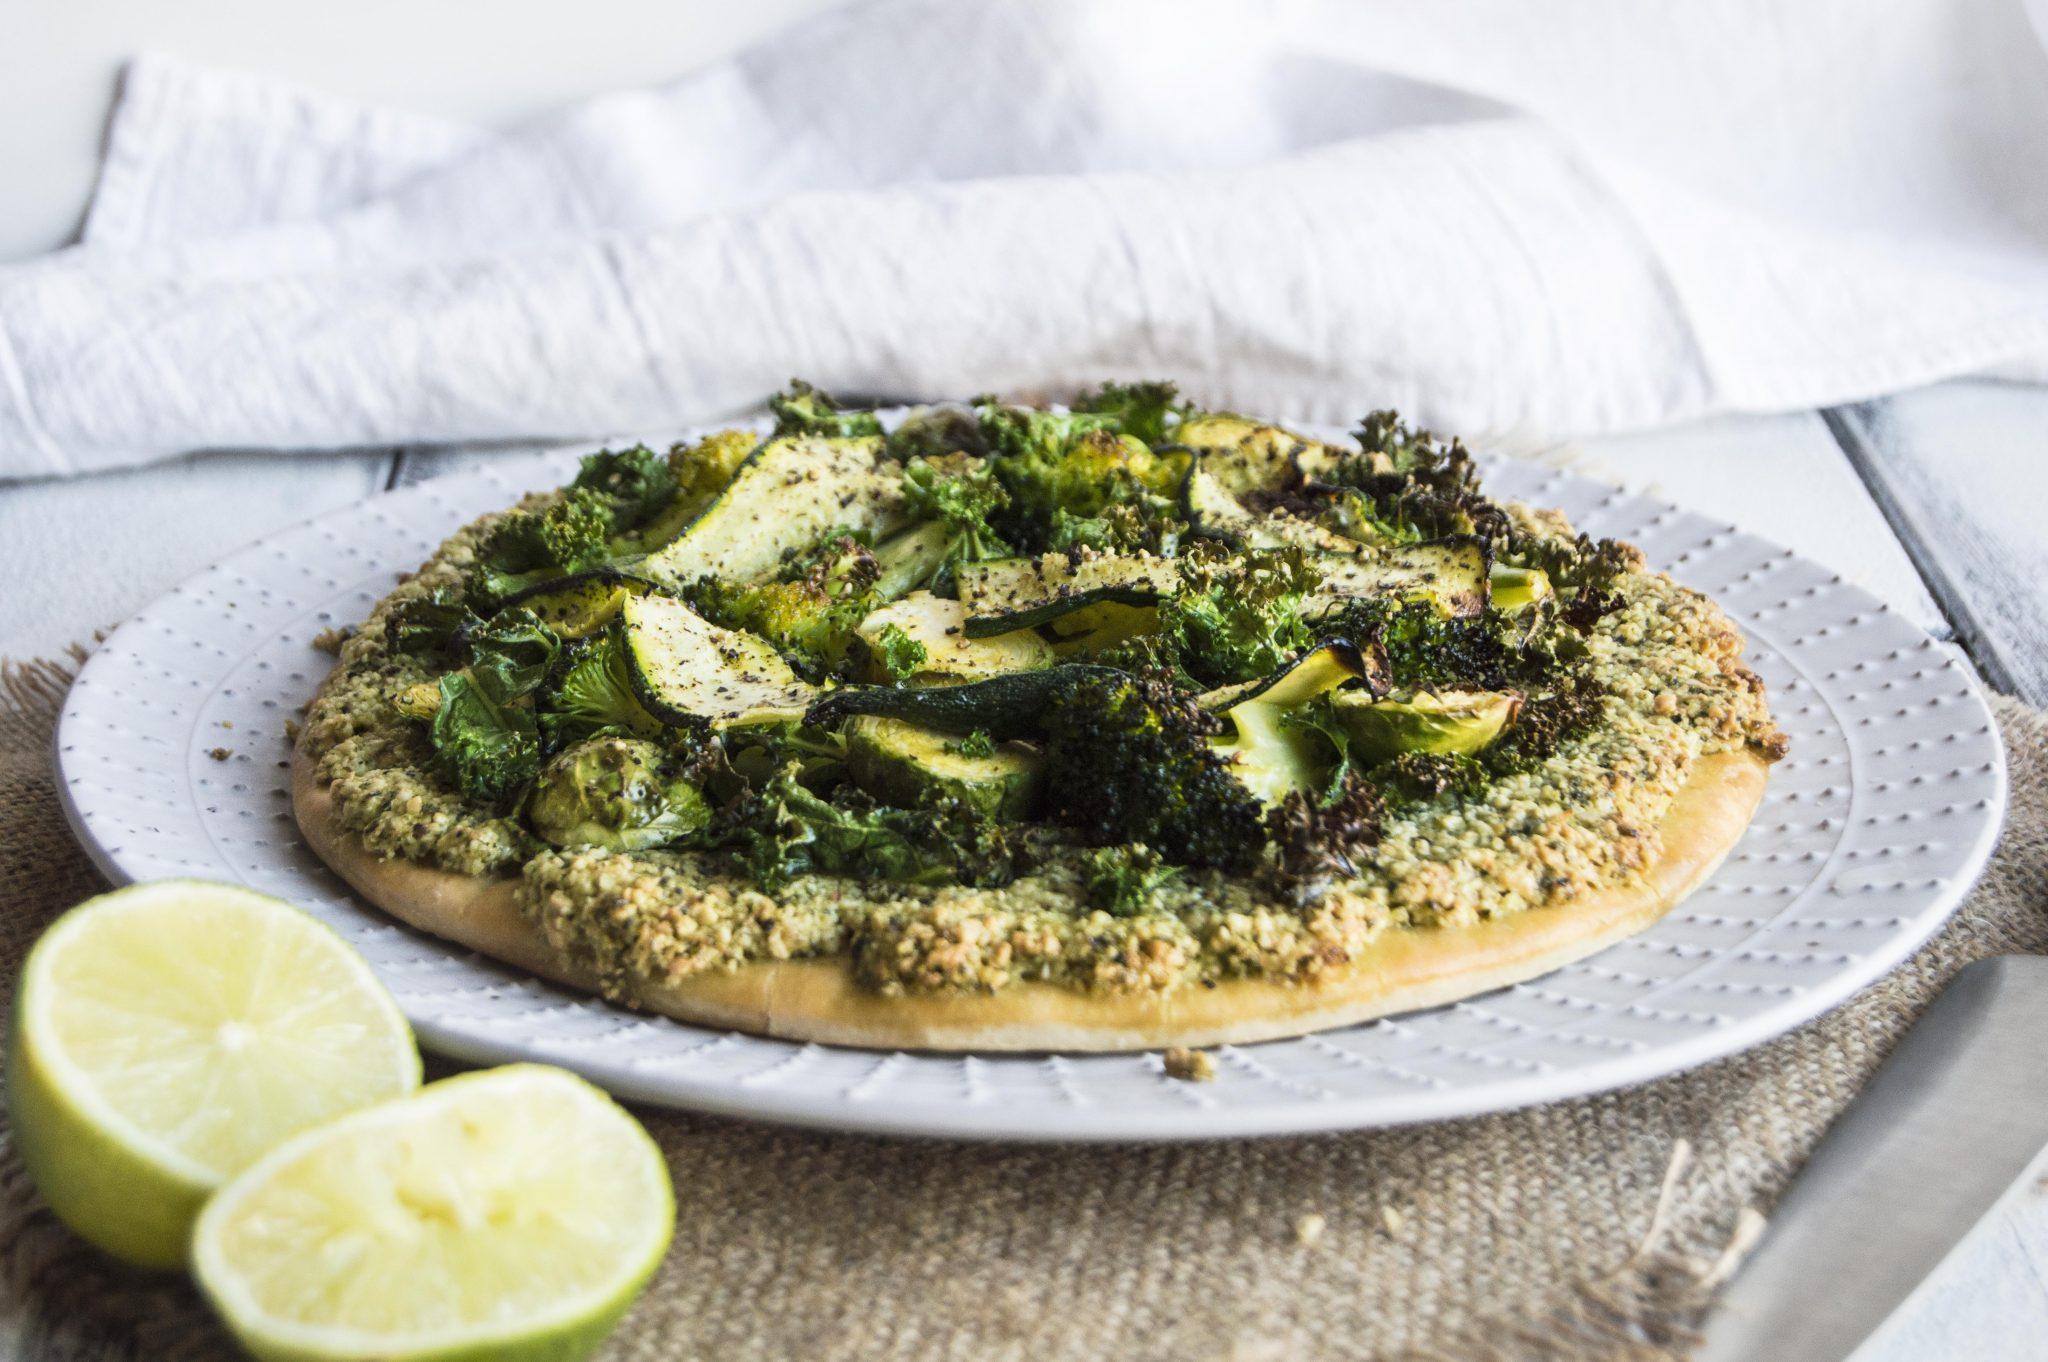 Vegan Pesto Pizza with Green Winter Vegetables